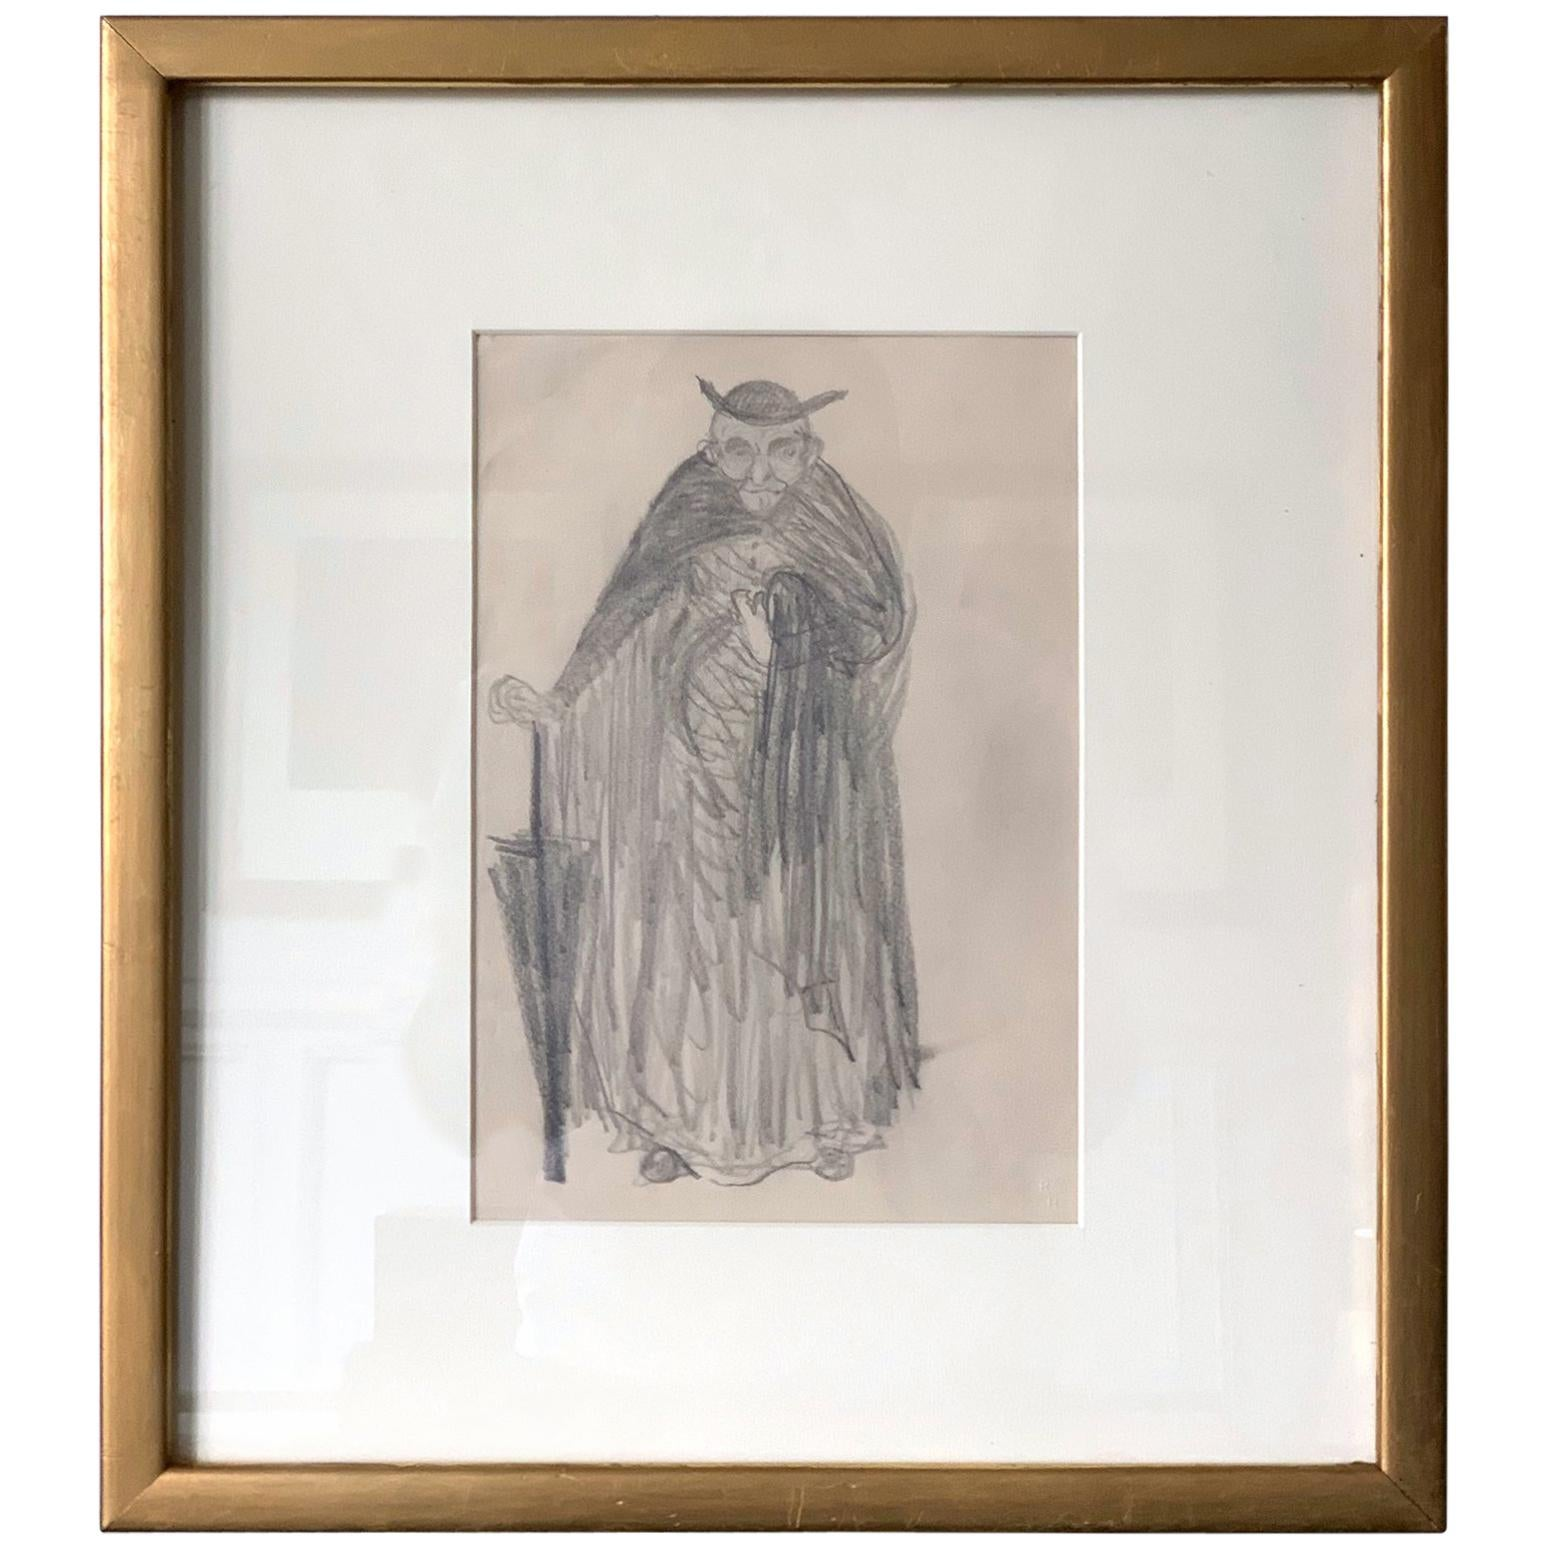 Framed Figurative Drawing by Robert Henri Ashcan School